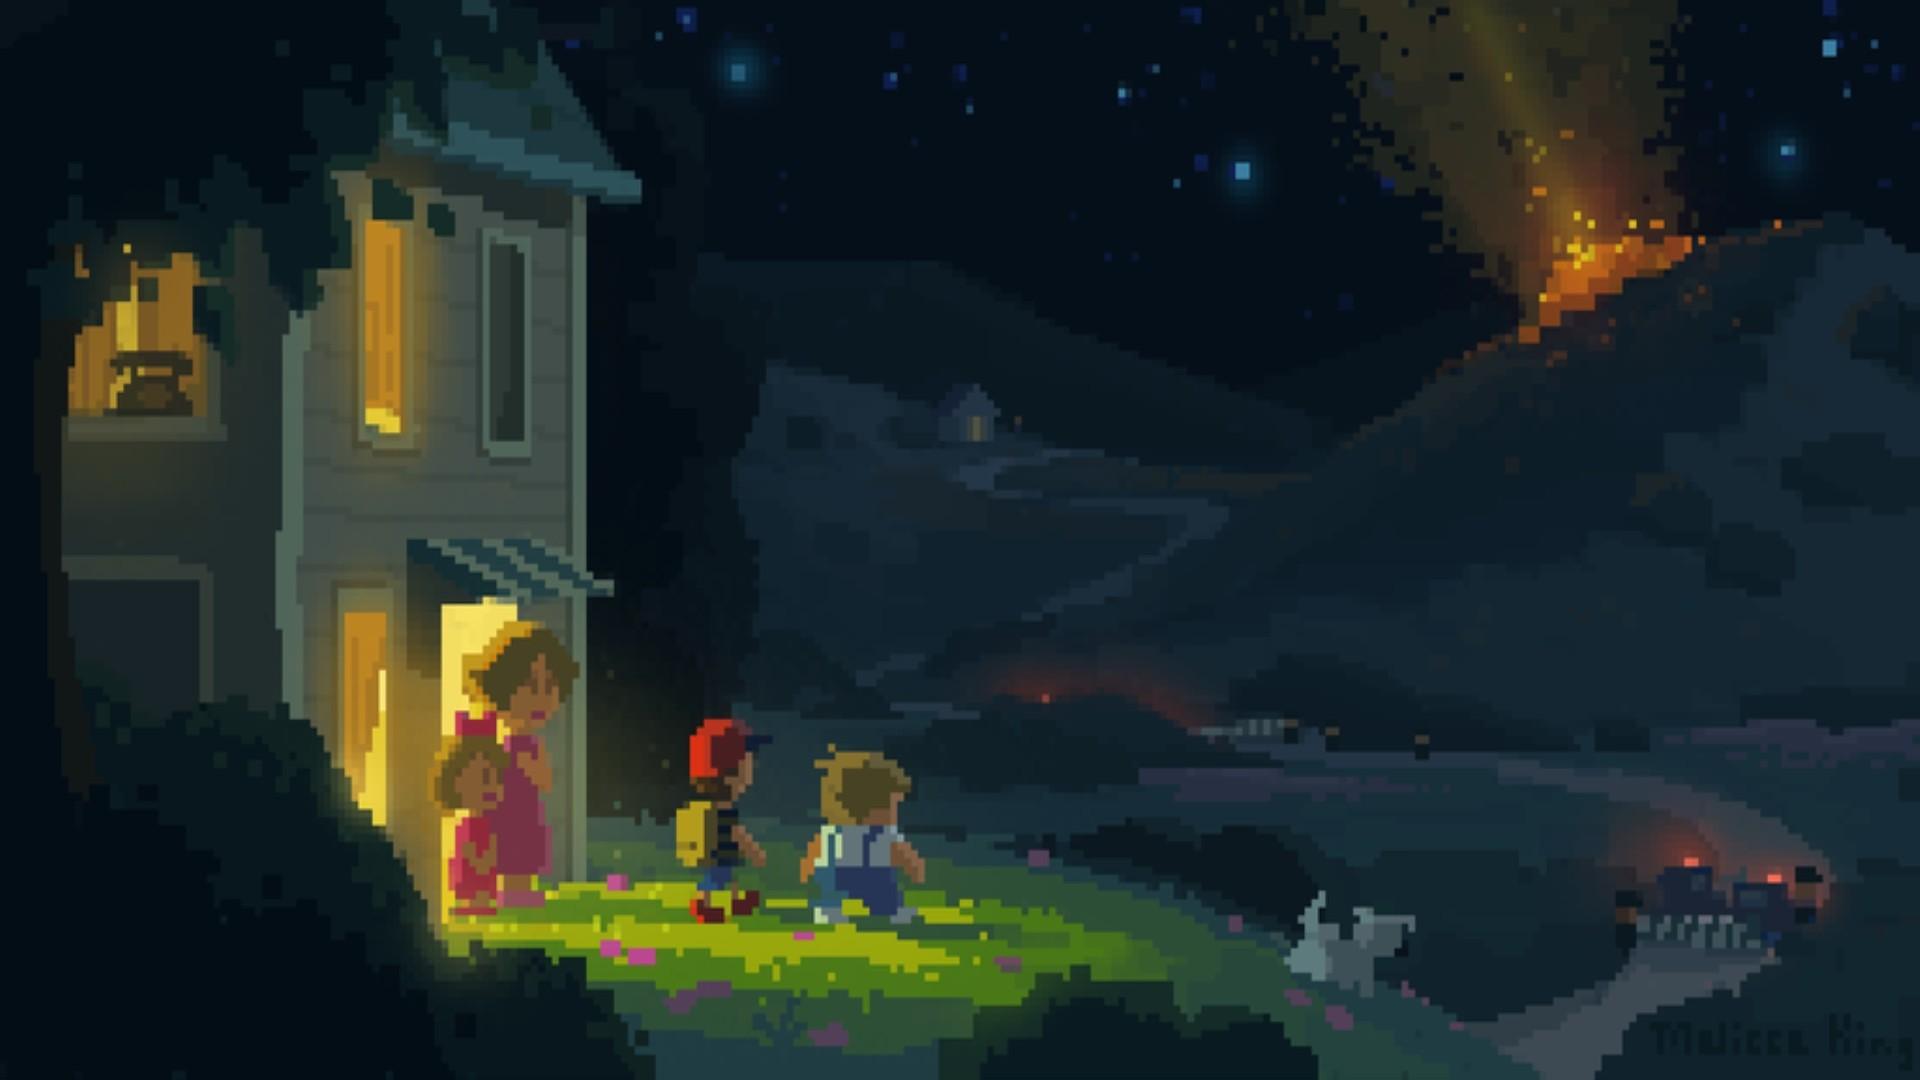 Retro Games Earthbound Minimalism Wallpaper